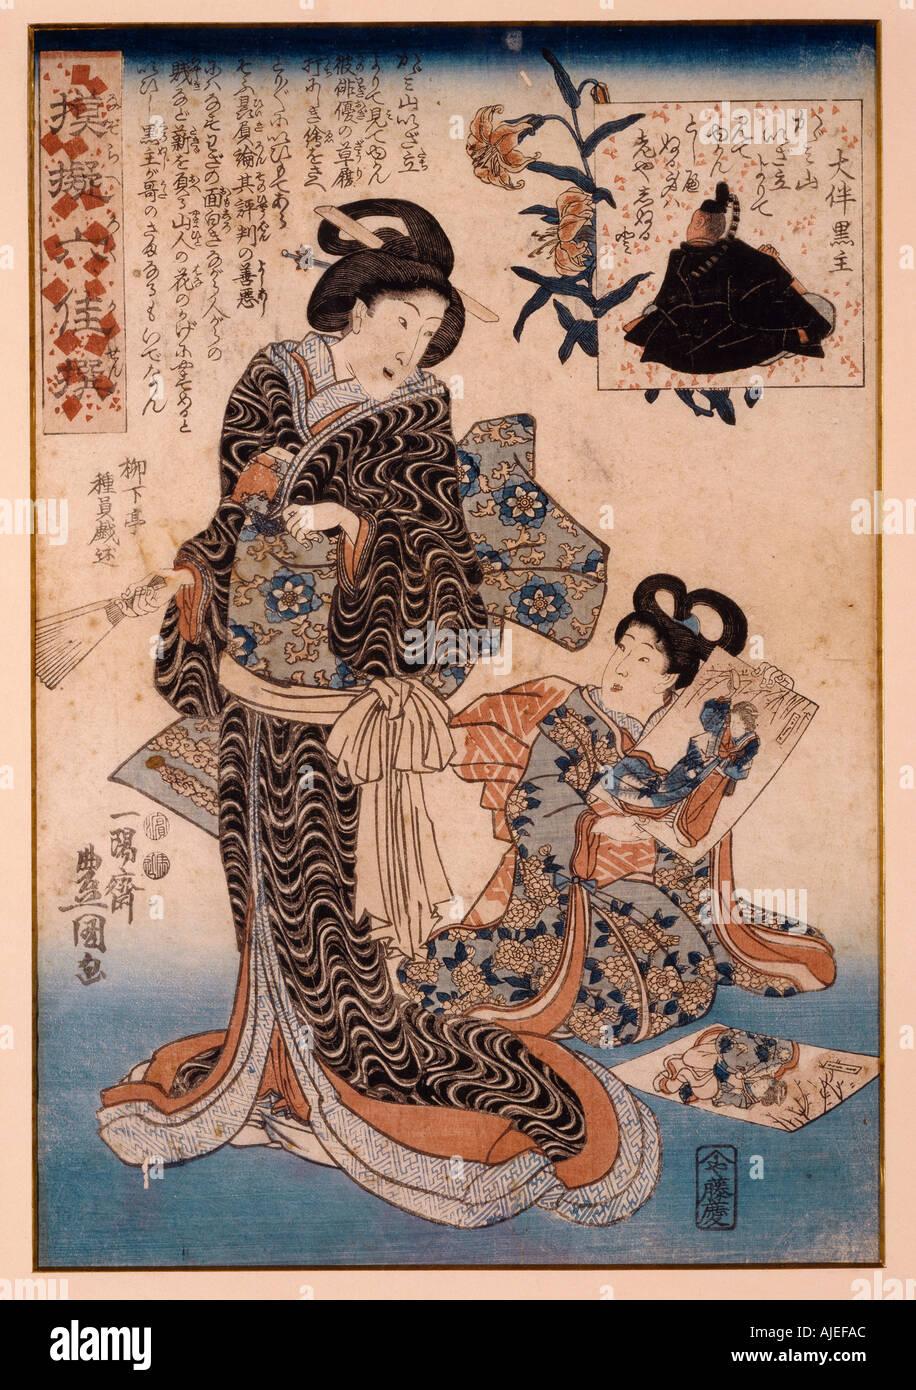 Other Asian Antiques Antiques Vintage Eingerahmt Japanischer Druck